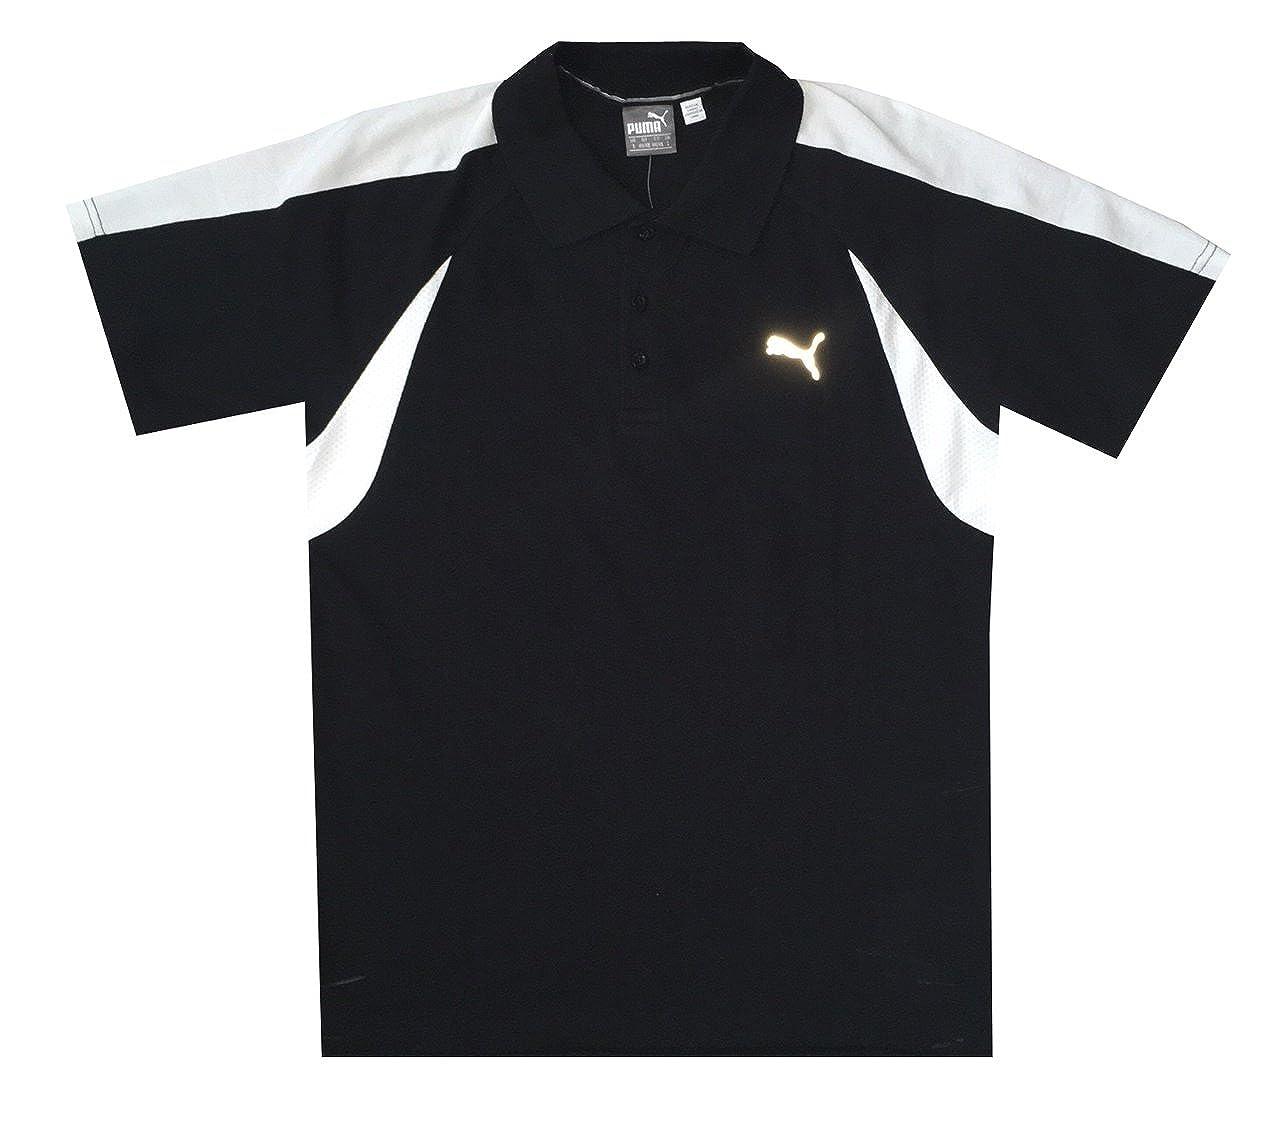 bf0f2c9d1fa5 PUMA Men dryCELL Active Polo Shirt at Amazon Men s Clothing store